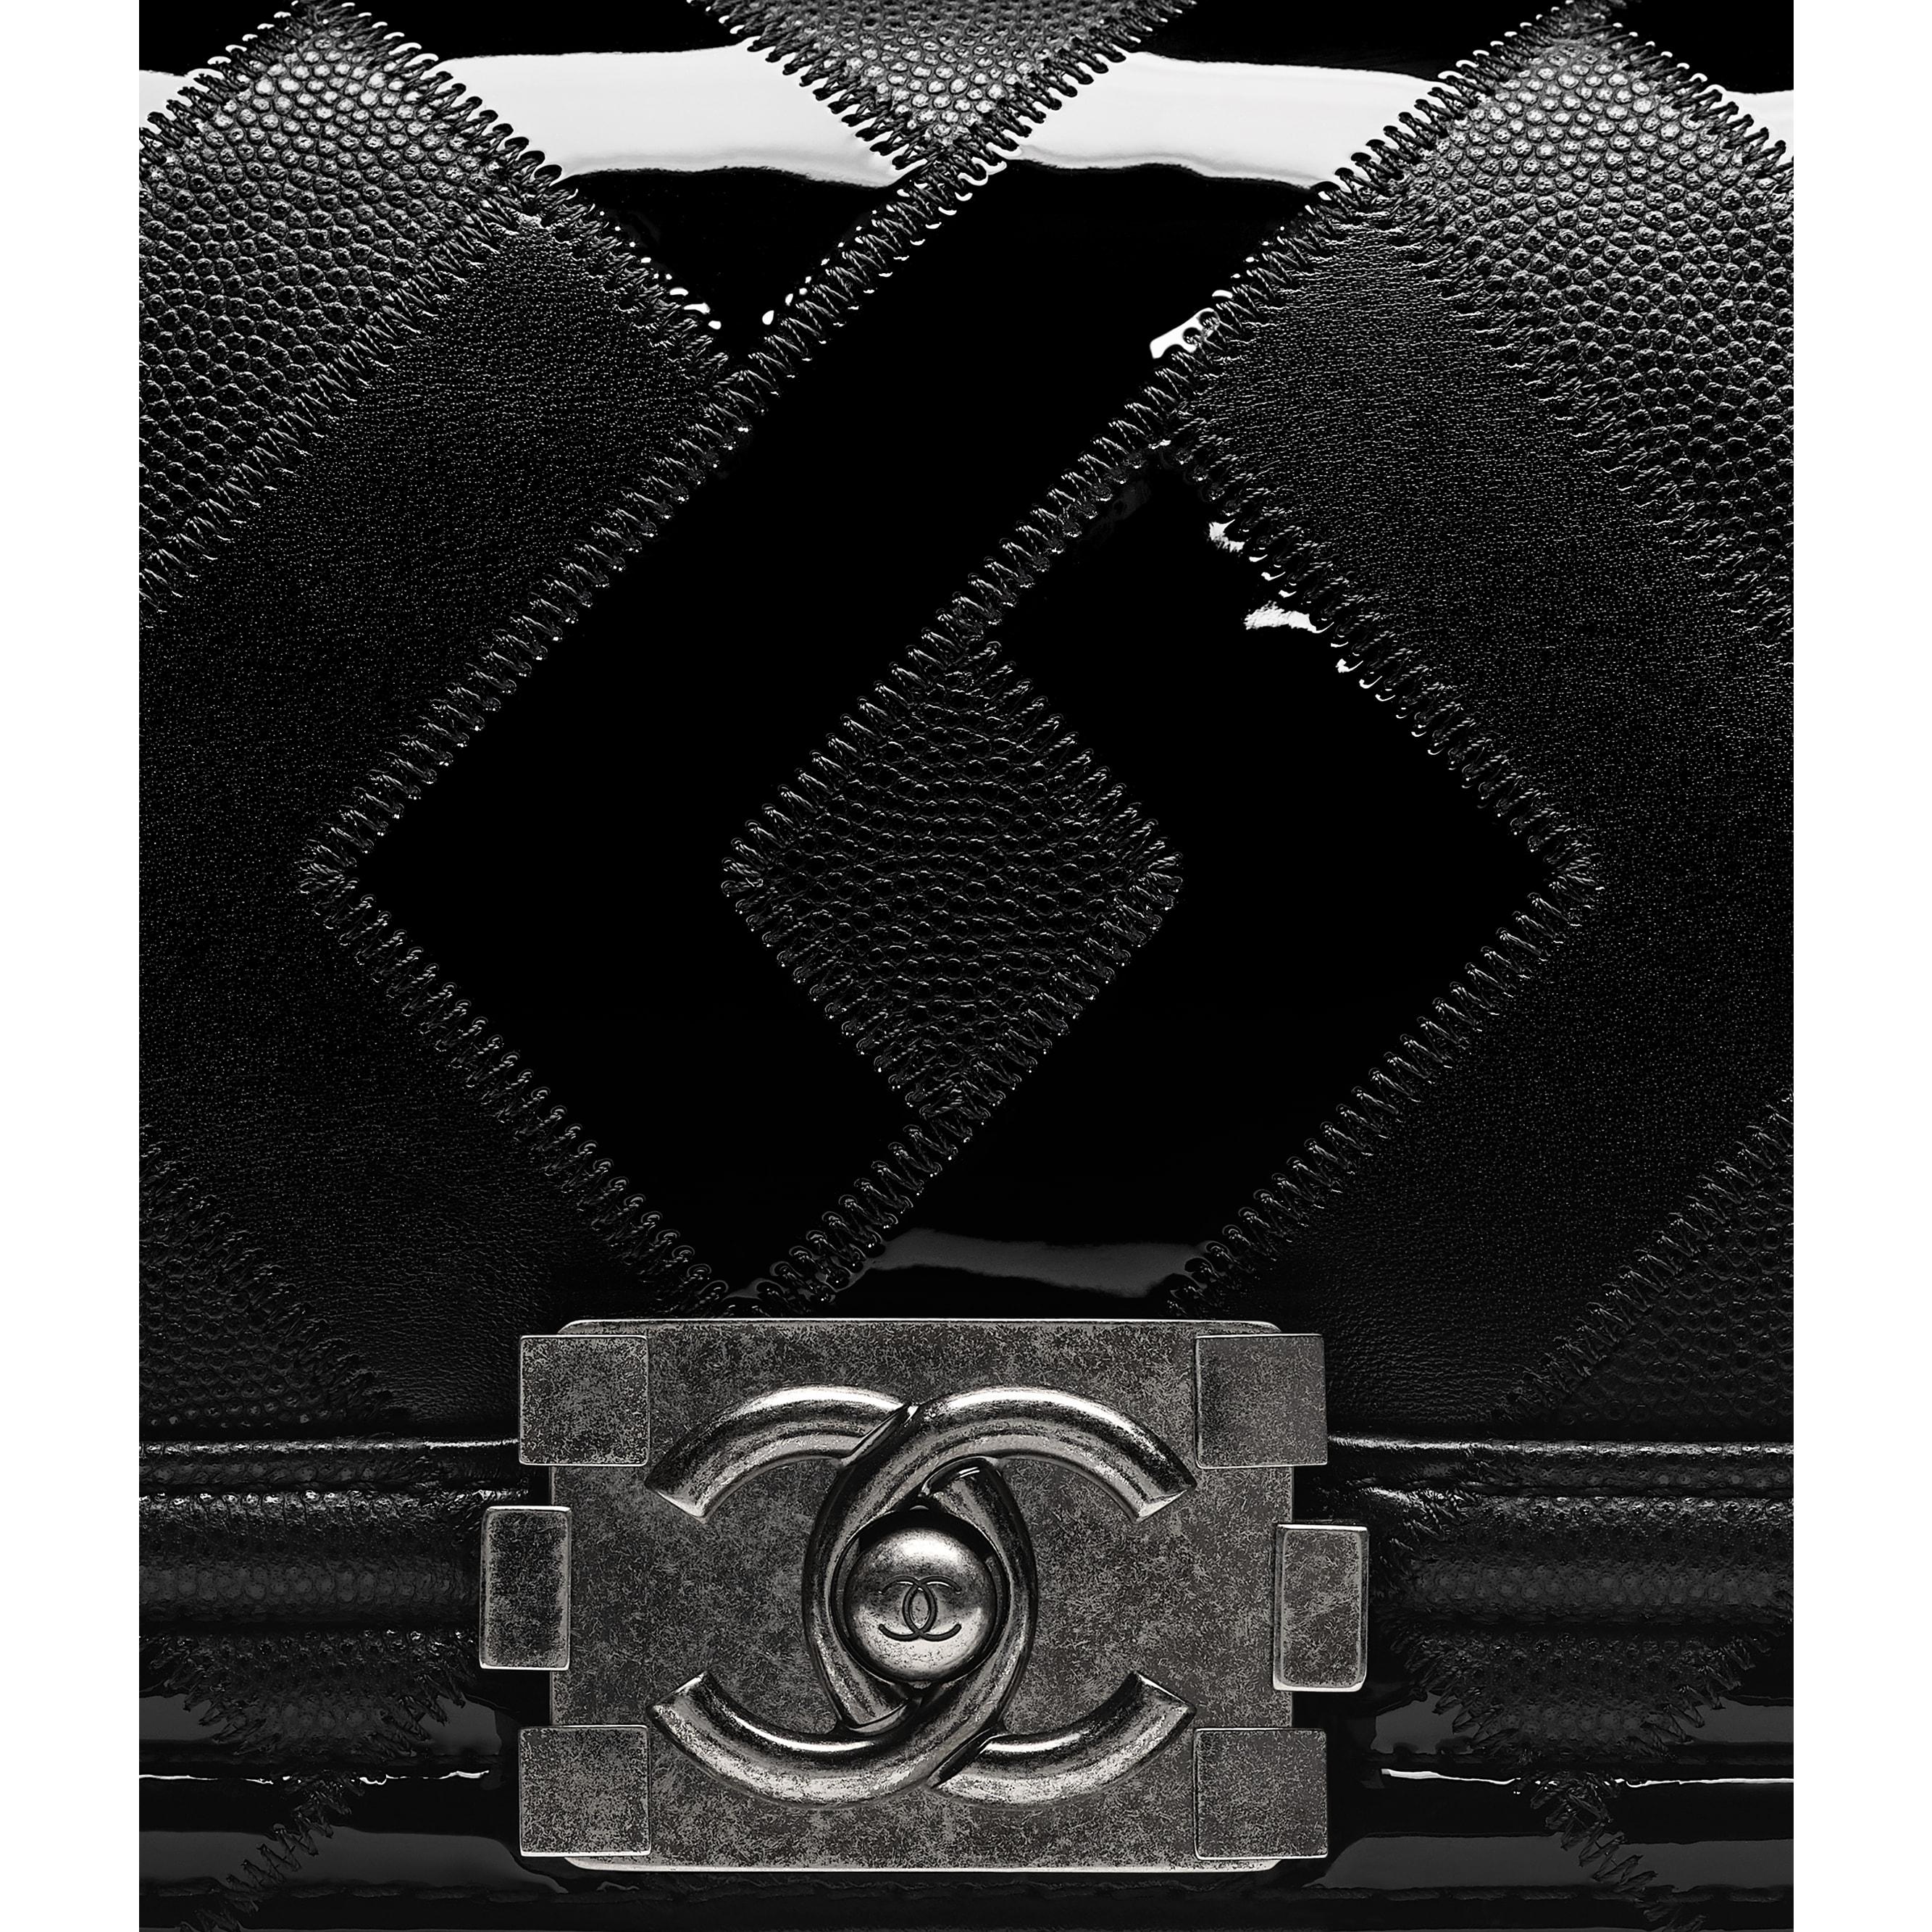 Small BOY CHANEL Handbag - Black - Calfskin, Patent Calfskin, Grained Calfskin & Ruthenium-Finish Metal - Extra view - see standard sized version